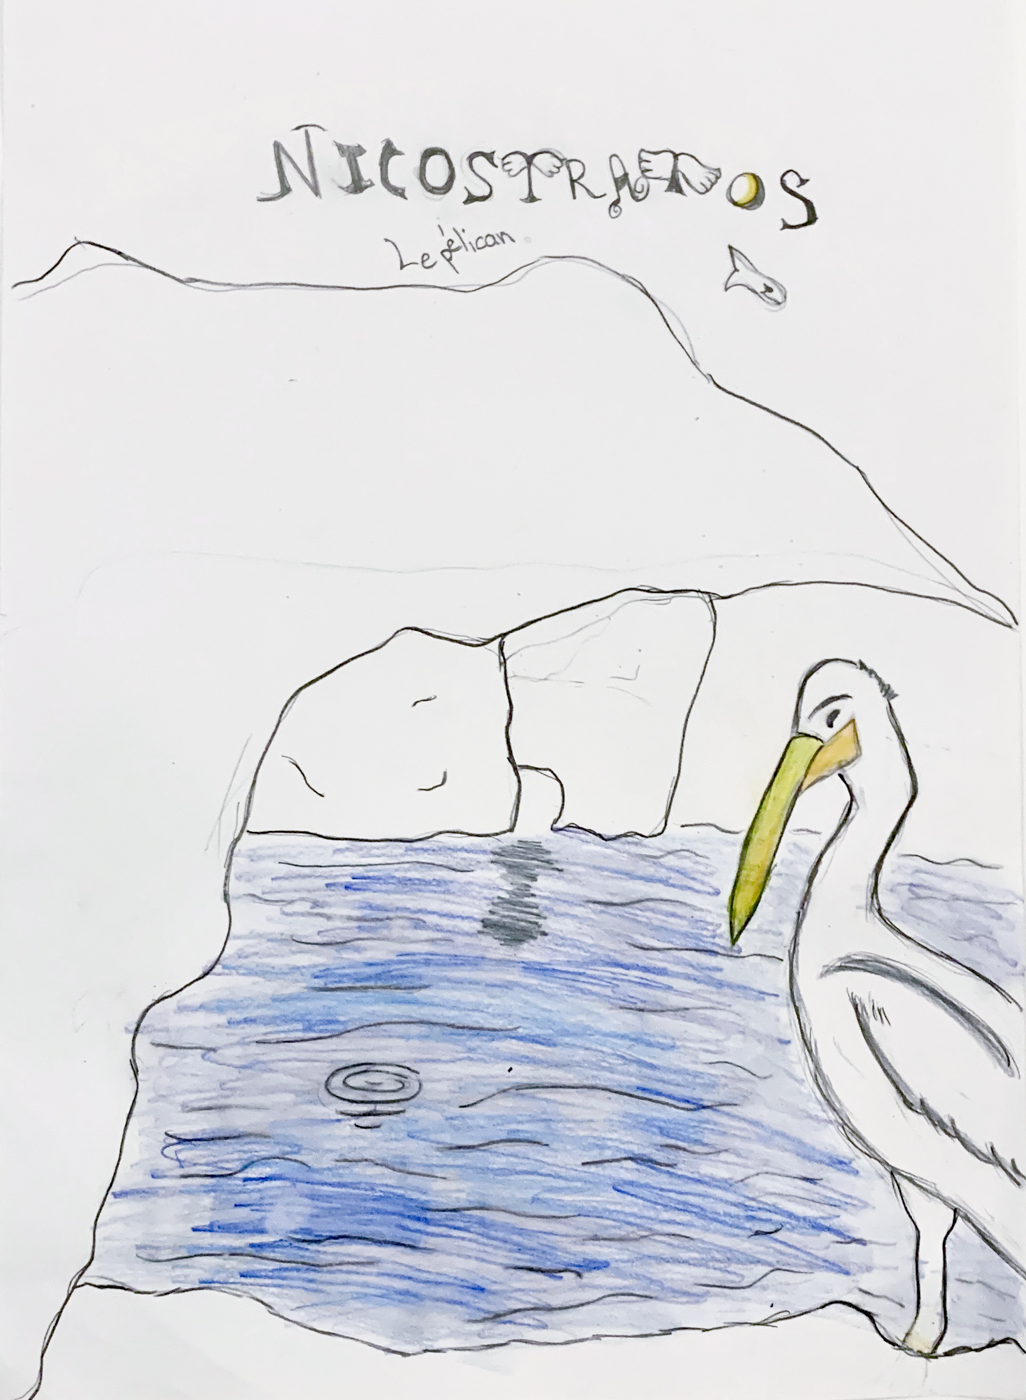 nicostratos le pelican